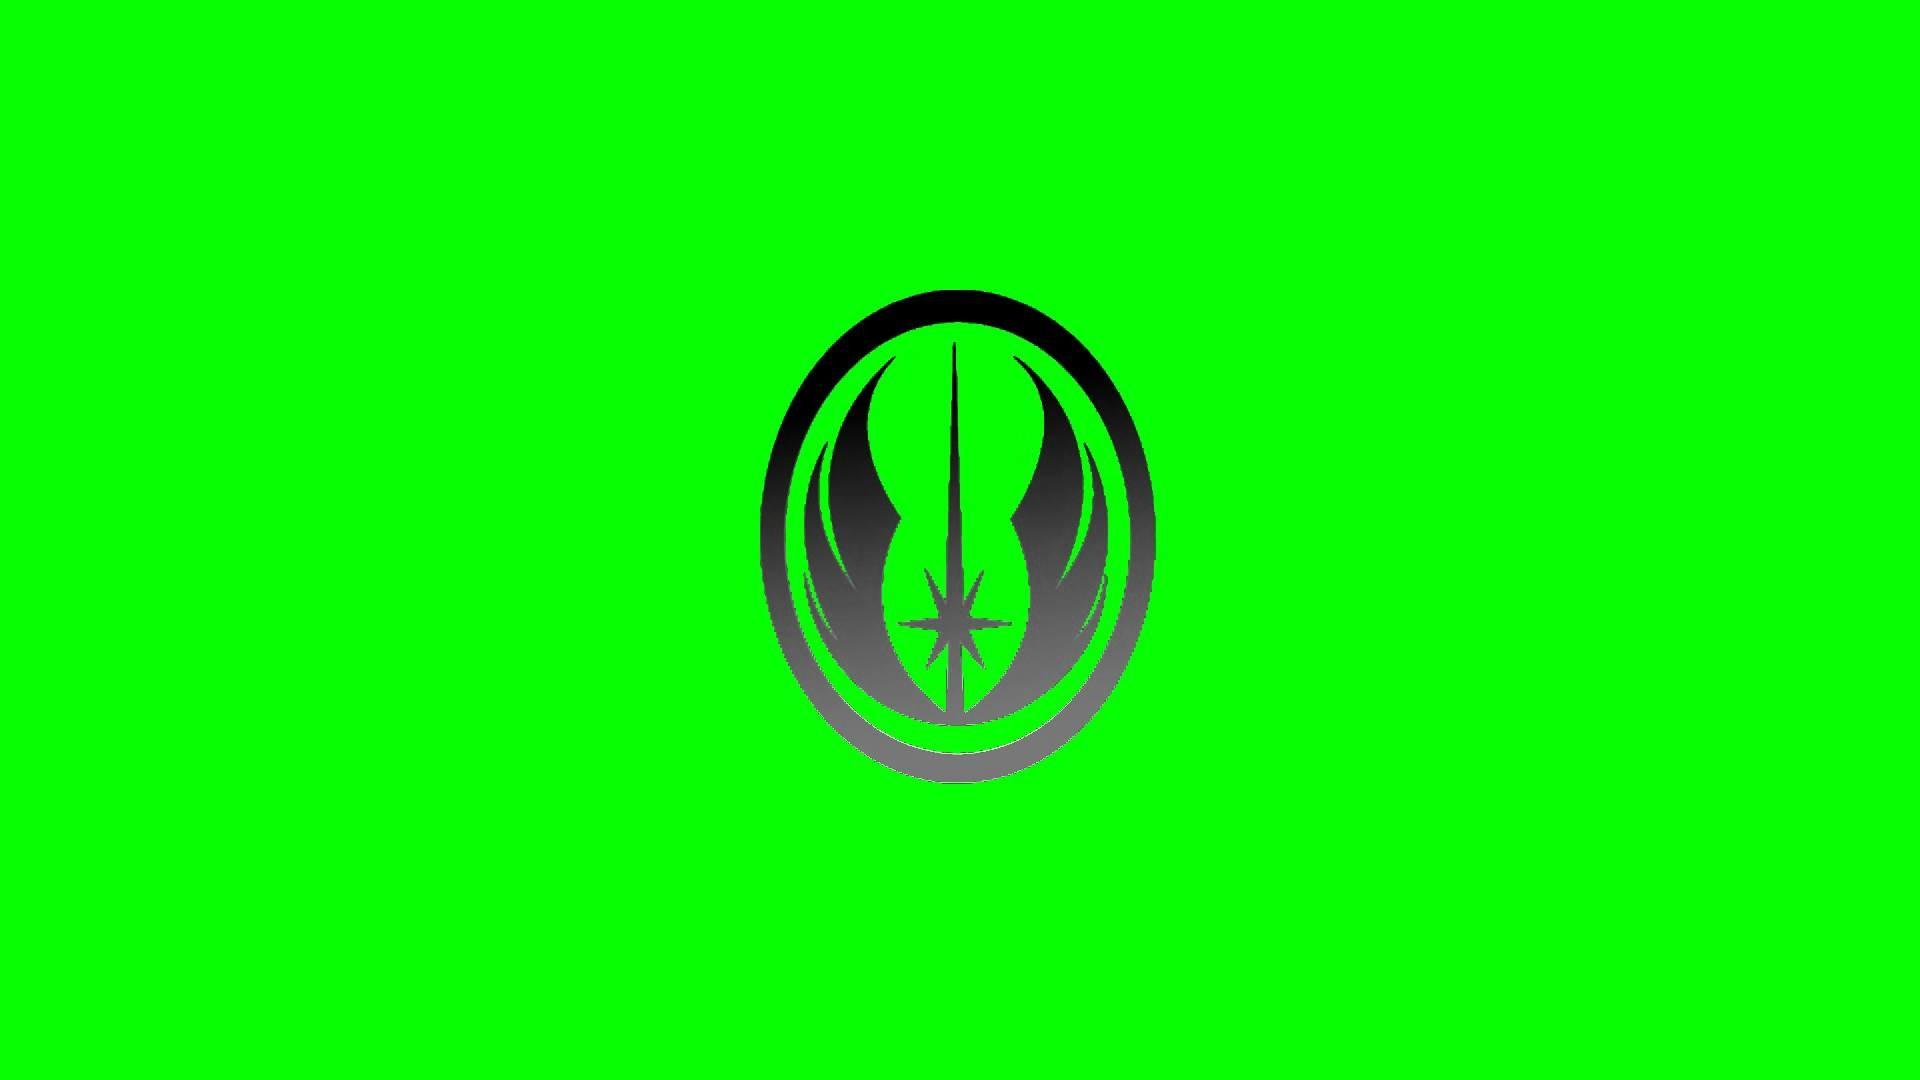 Star Wars Jedi Order Symbol – Green Screen Animation